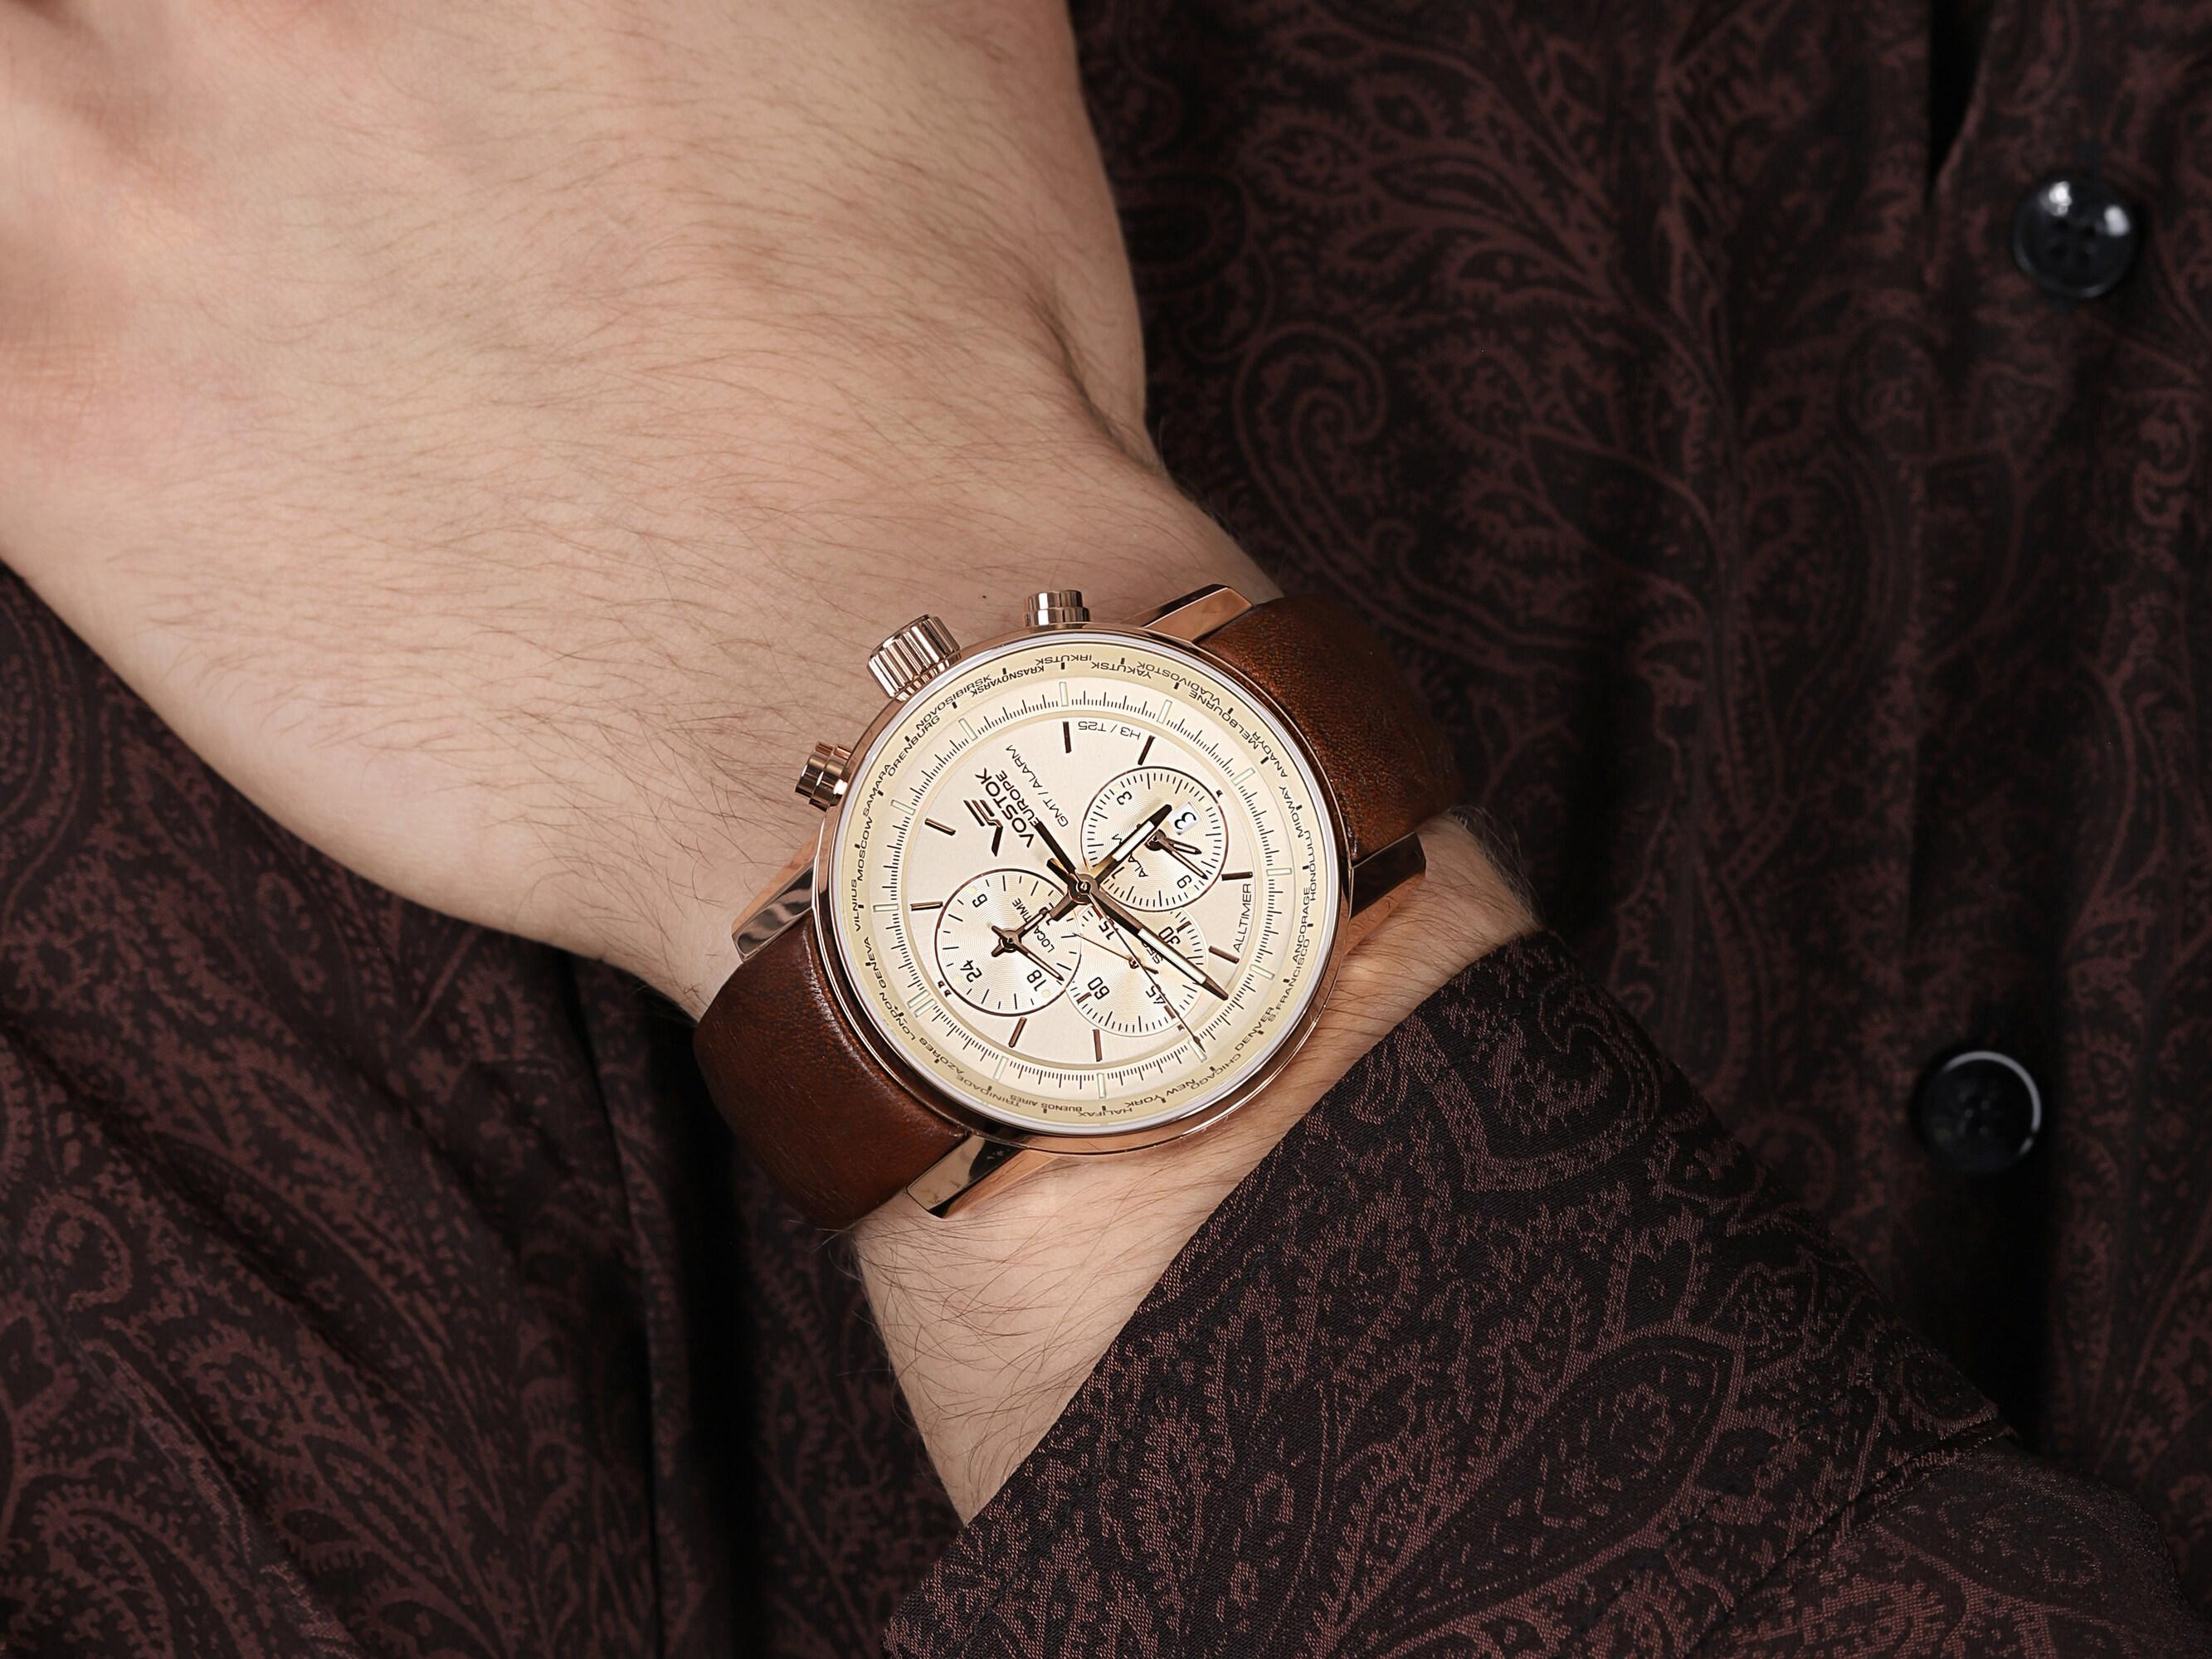 zegarek Vostok Europe YM26-565B294 Limousine Chrono męski z chronograf Limousine